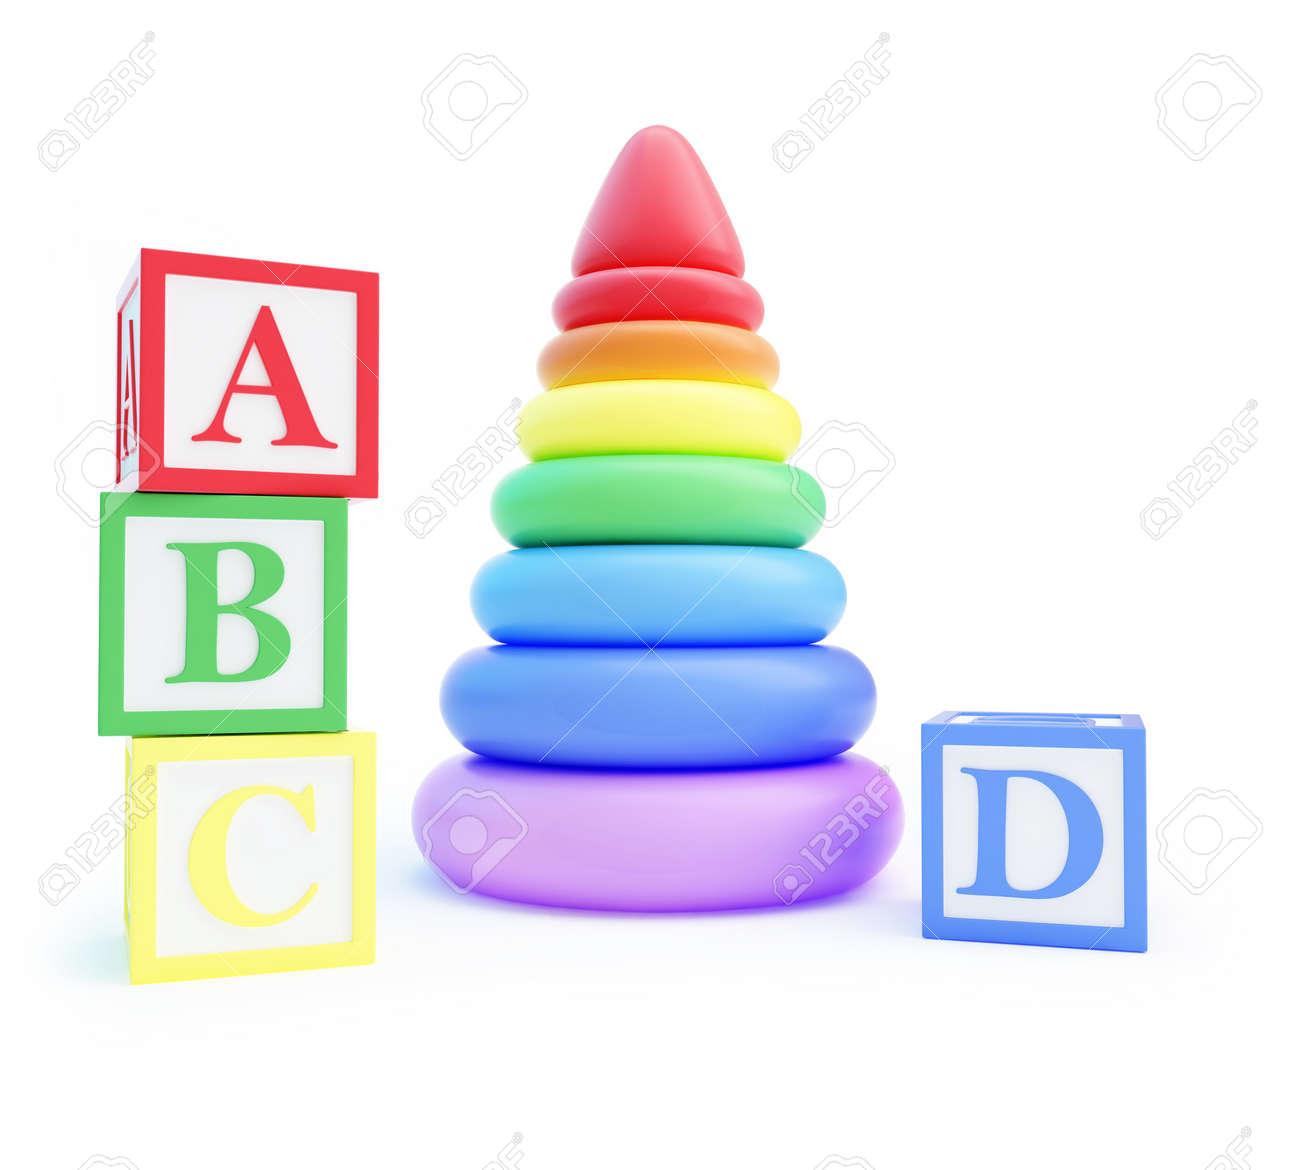 pyramid toy and alphabet blocks on a white background Stock Photo - 17577003